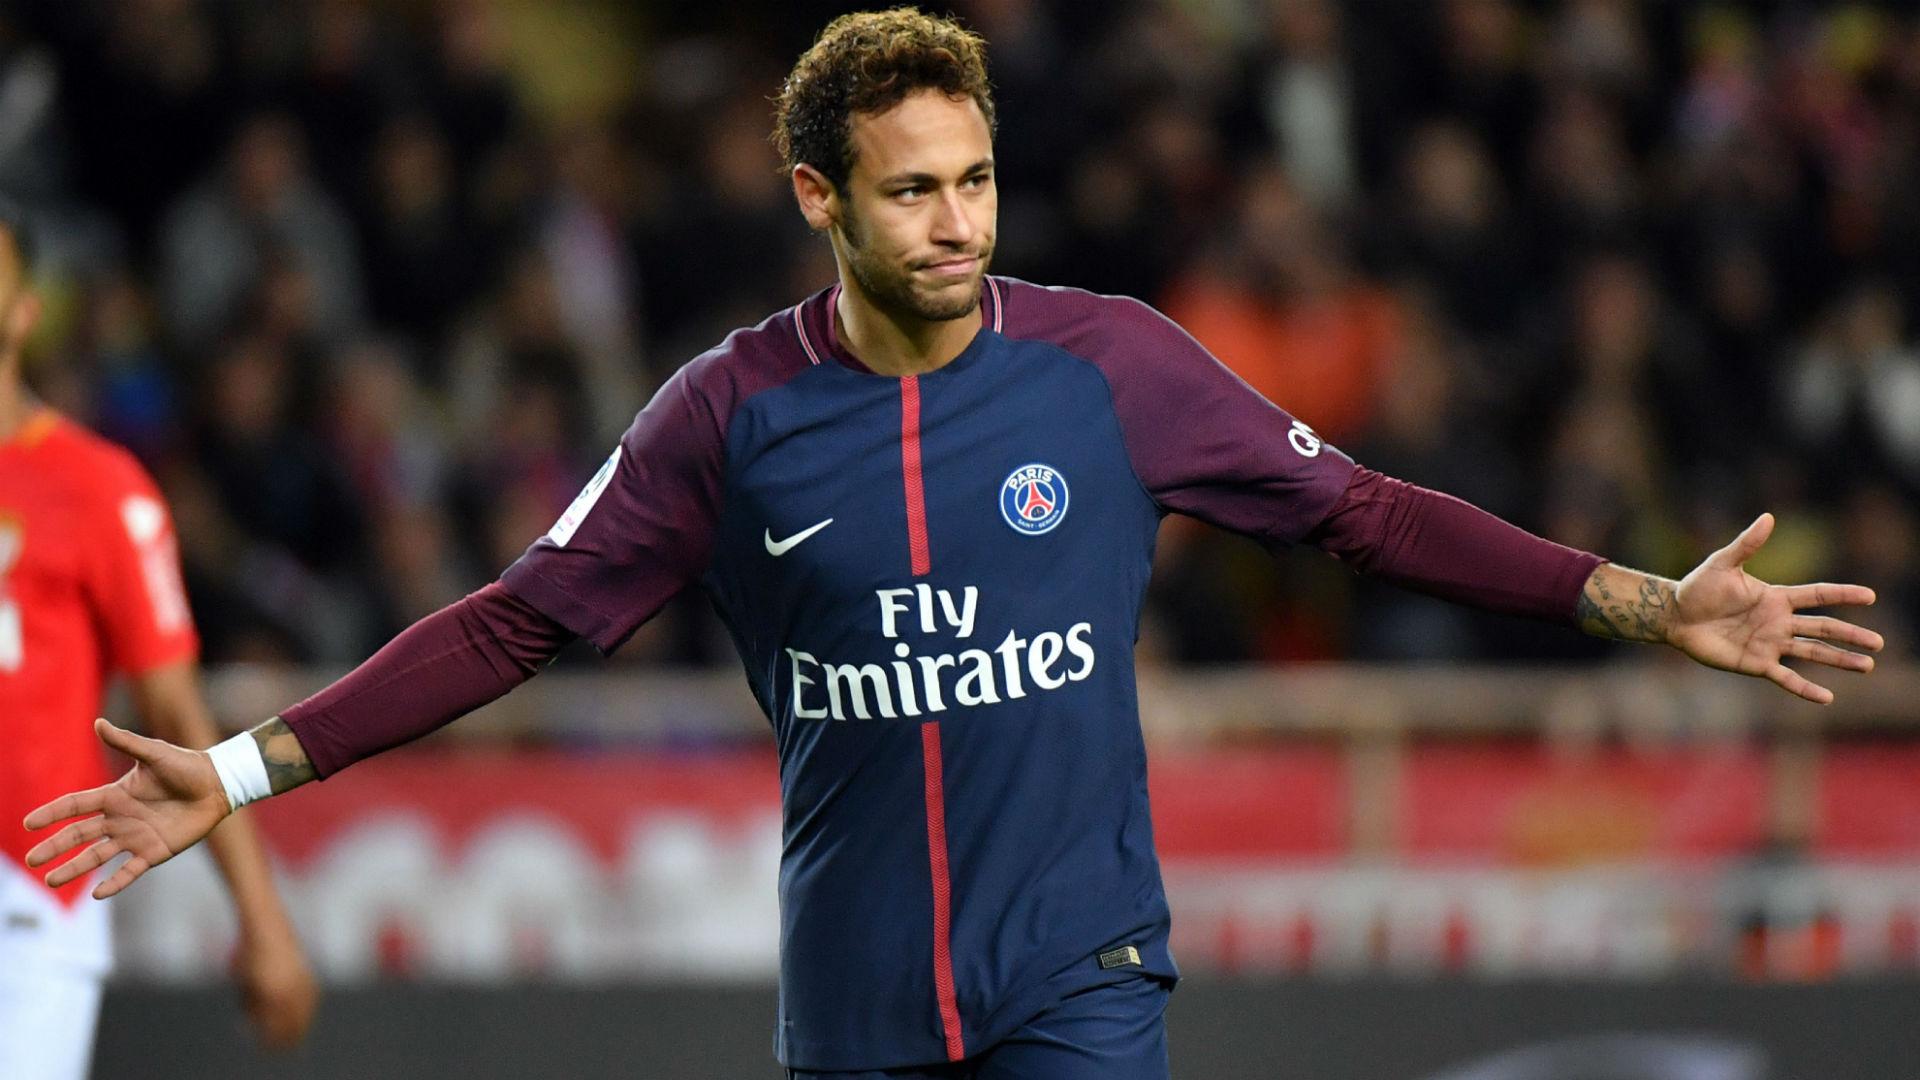 Photo of Real Madrid Will Sign PSG Star Neymar